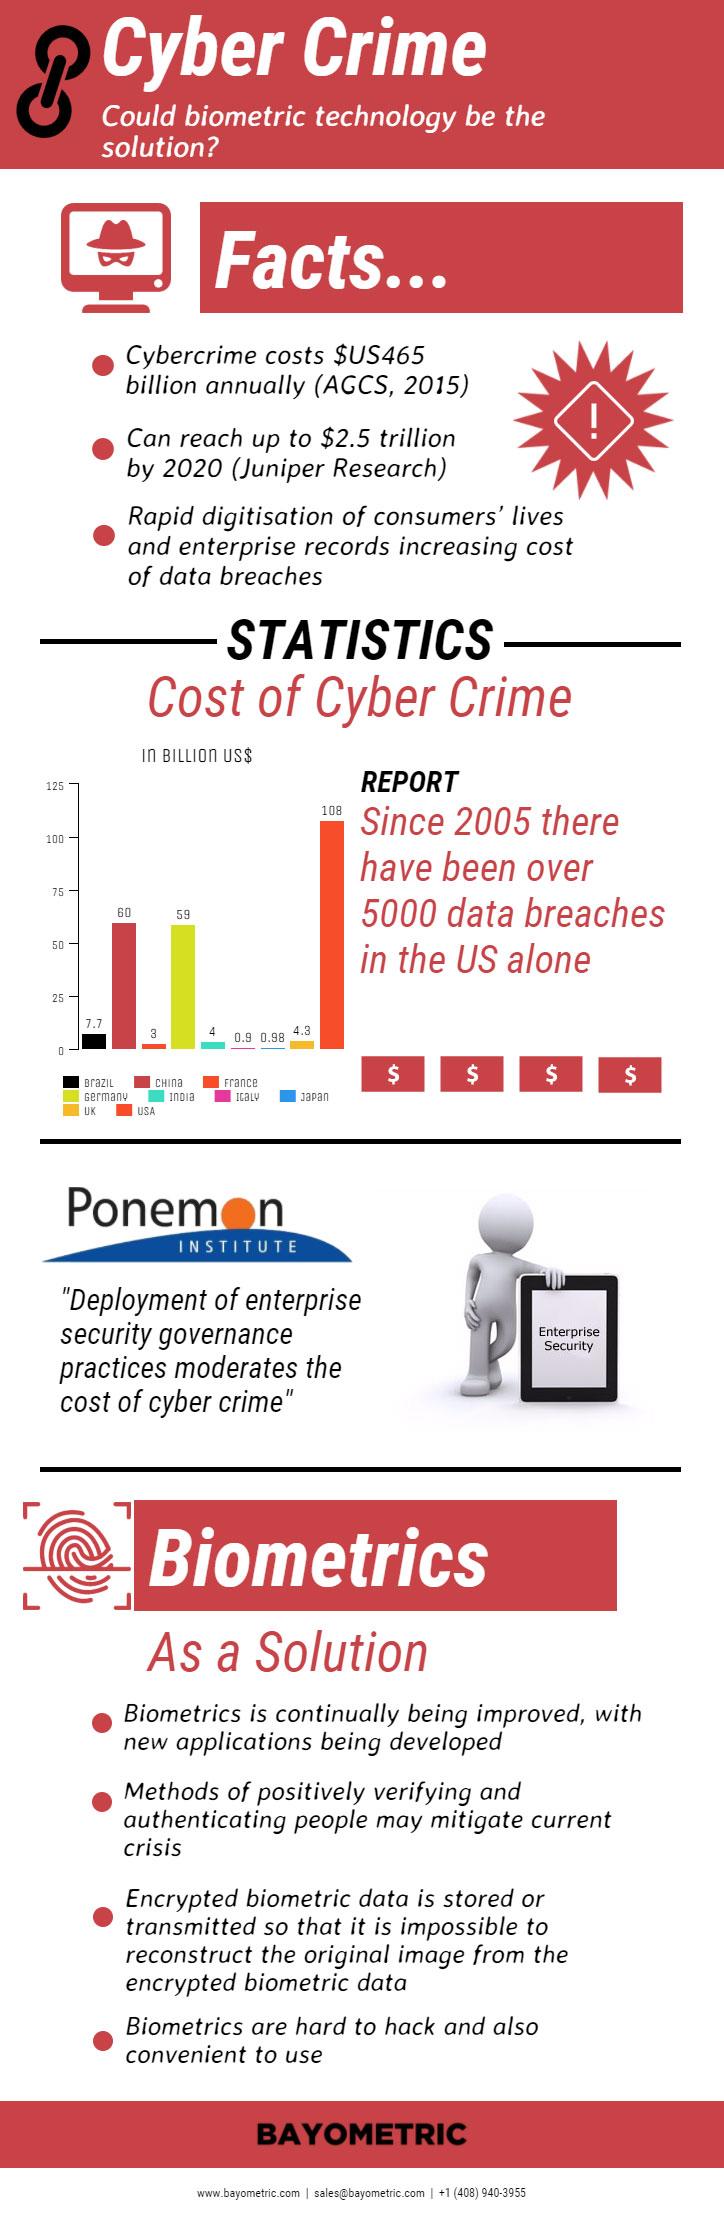 Biometrics to Stop Cybercrime